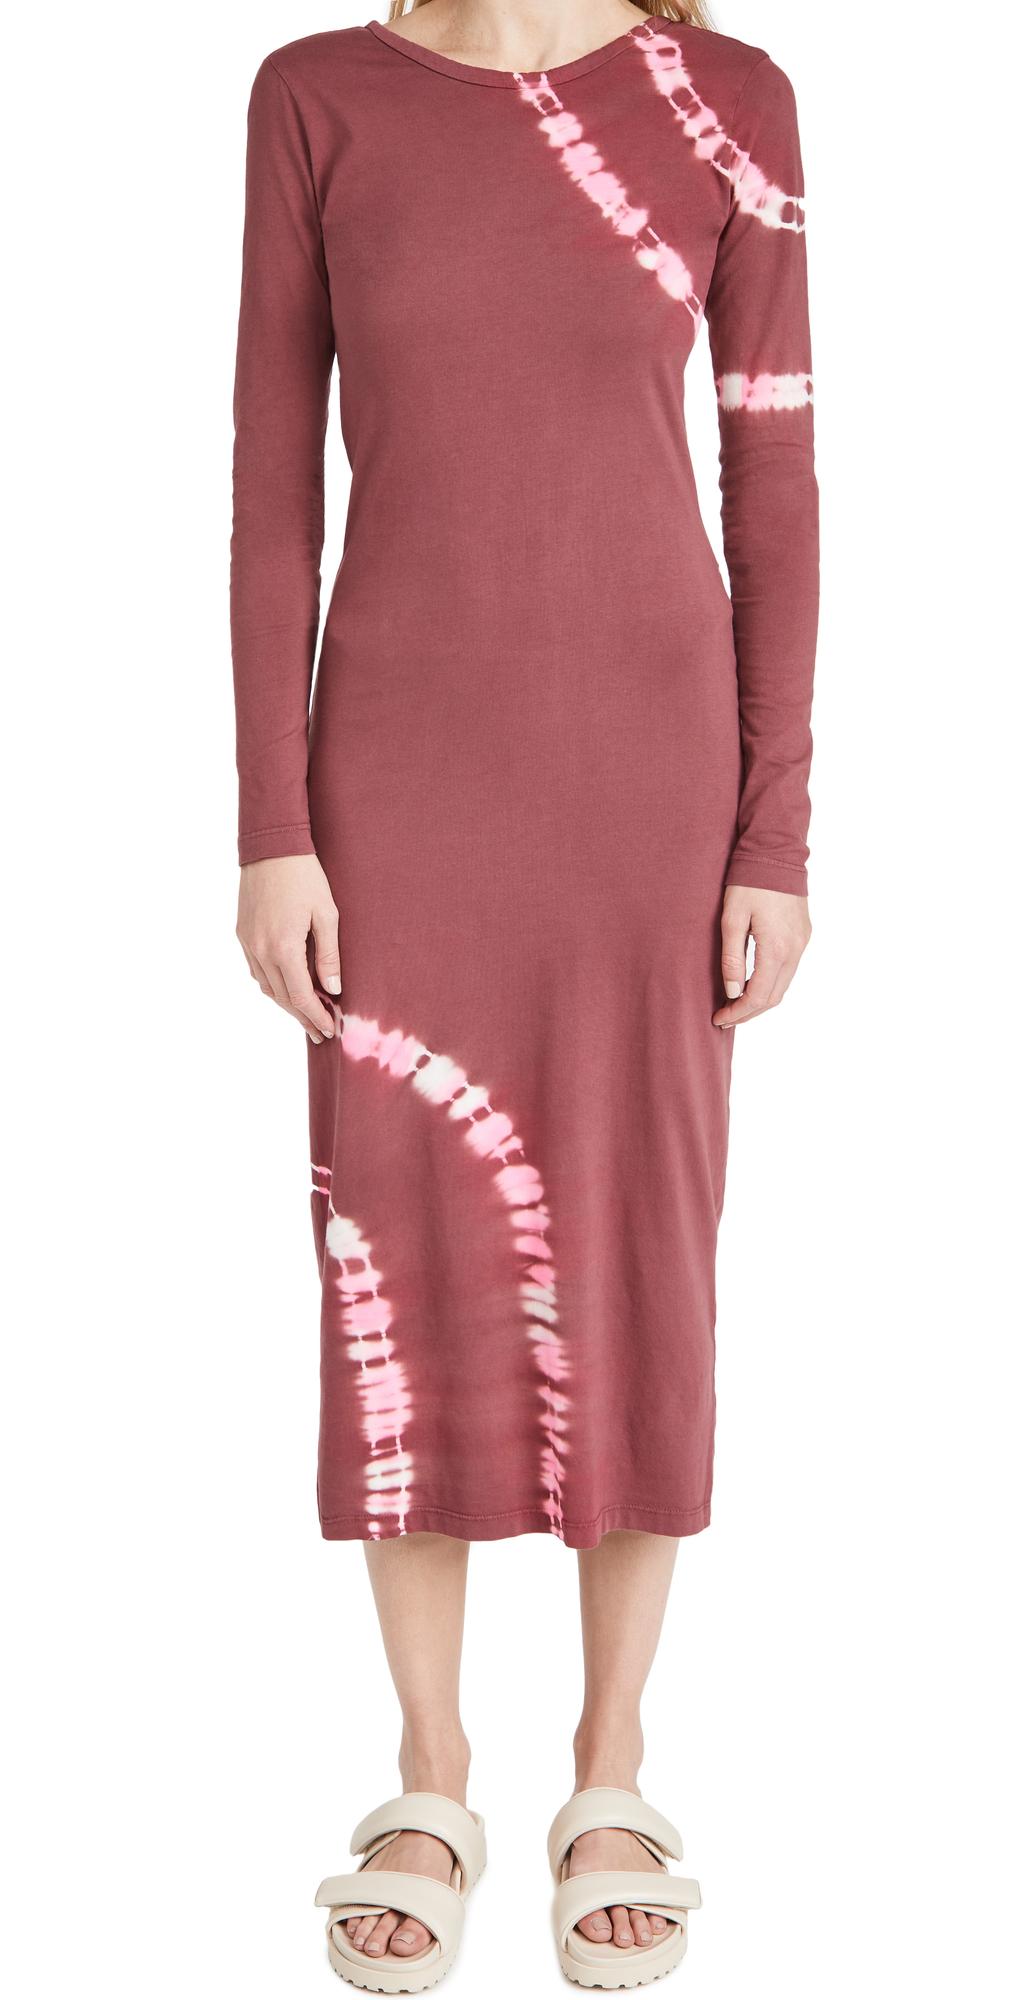 Pallo Dress